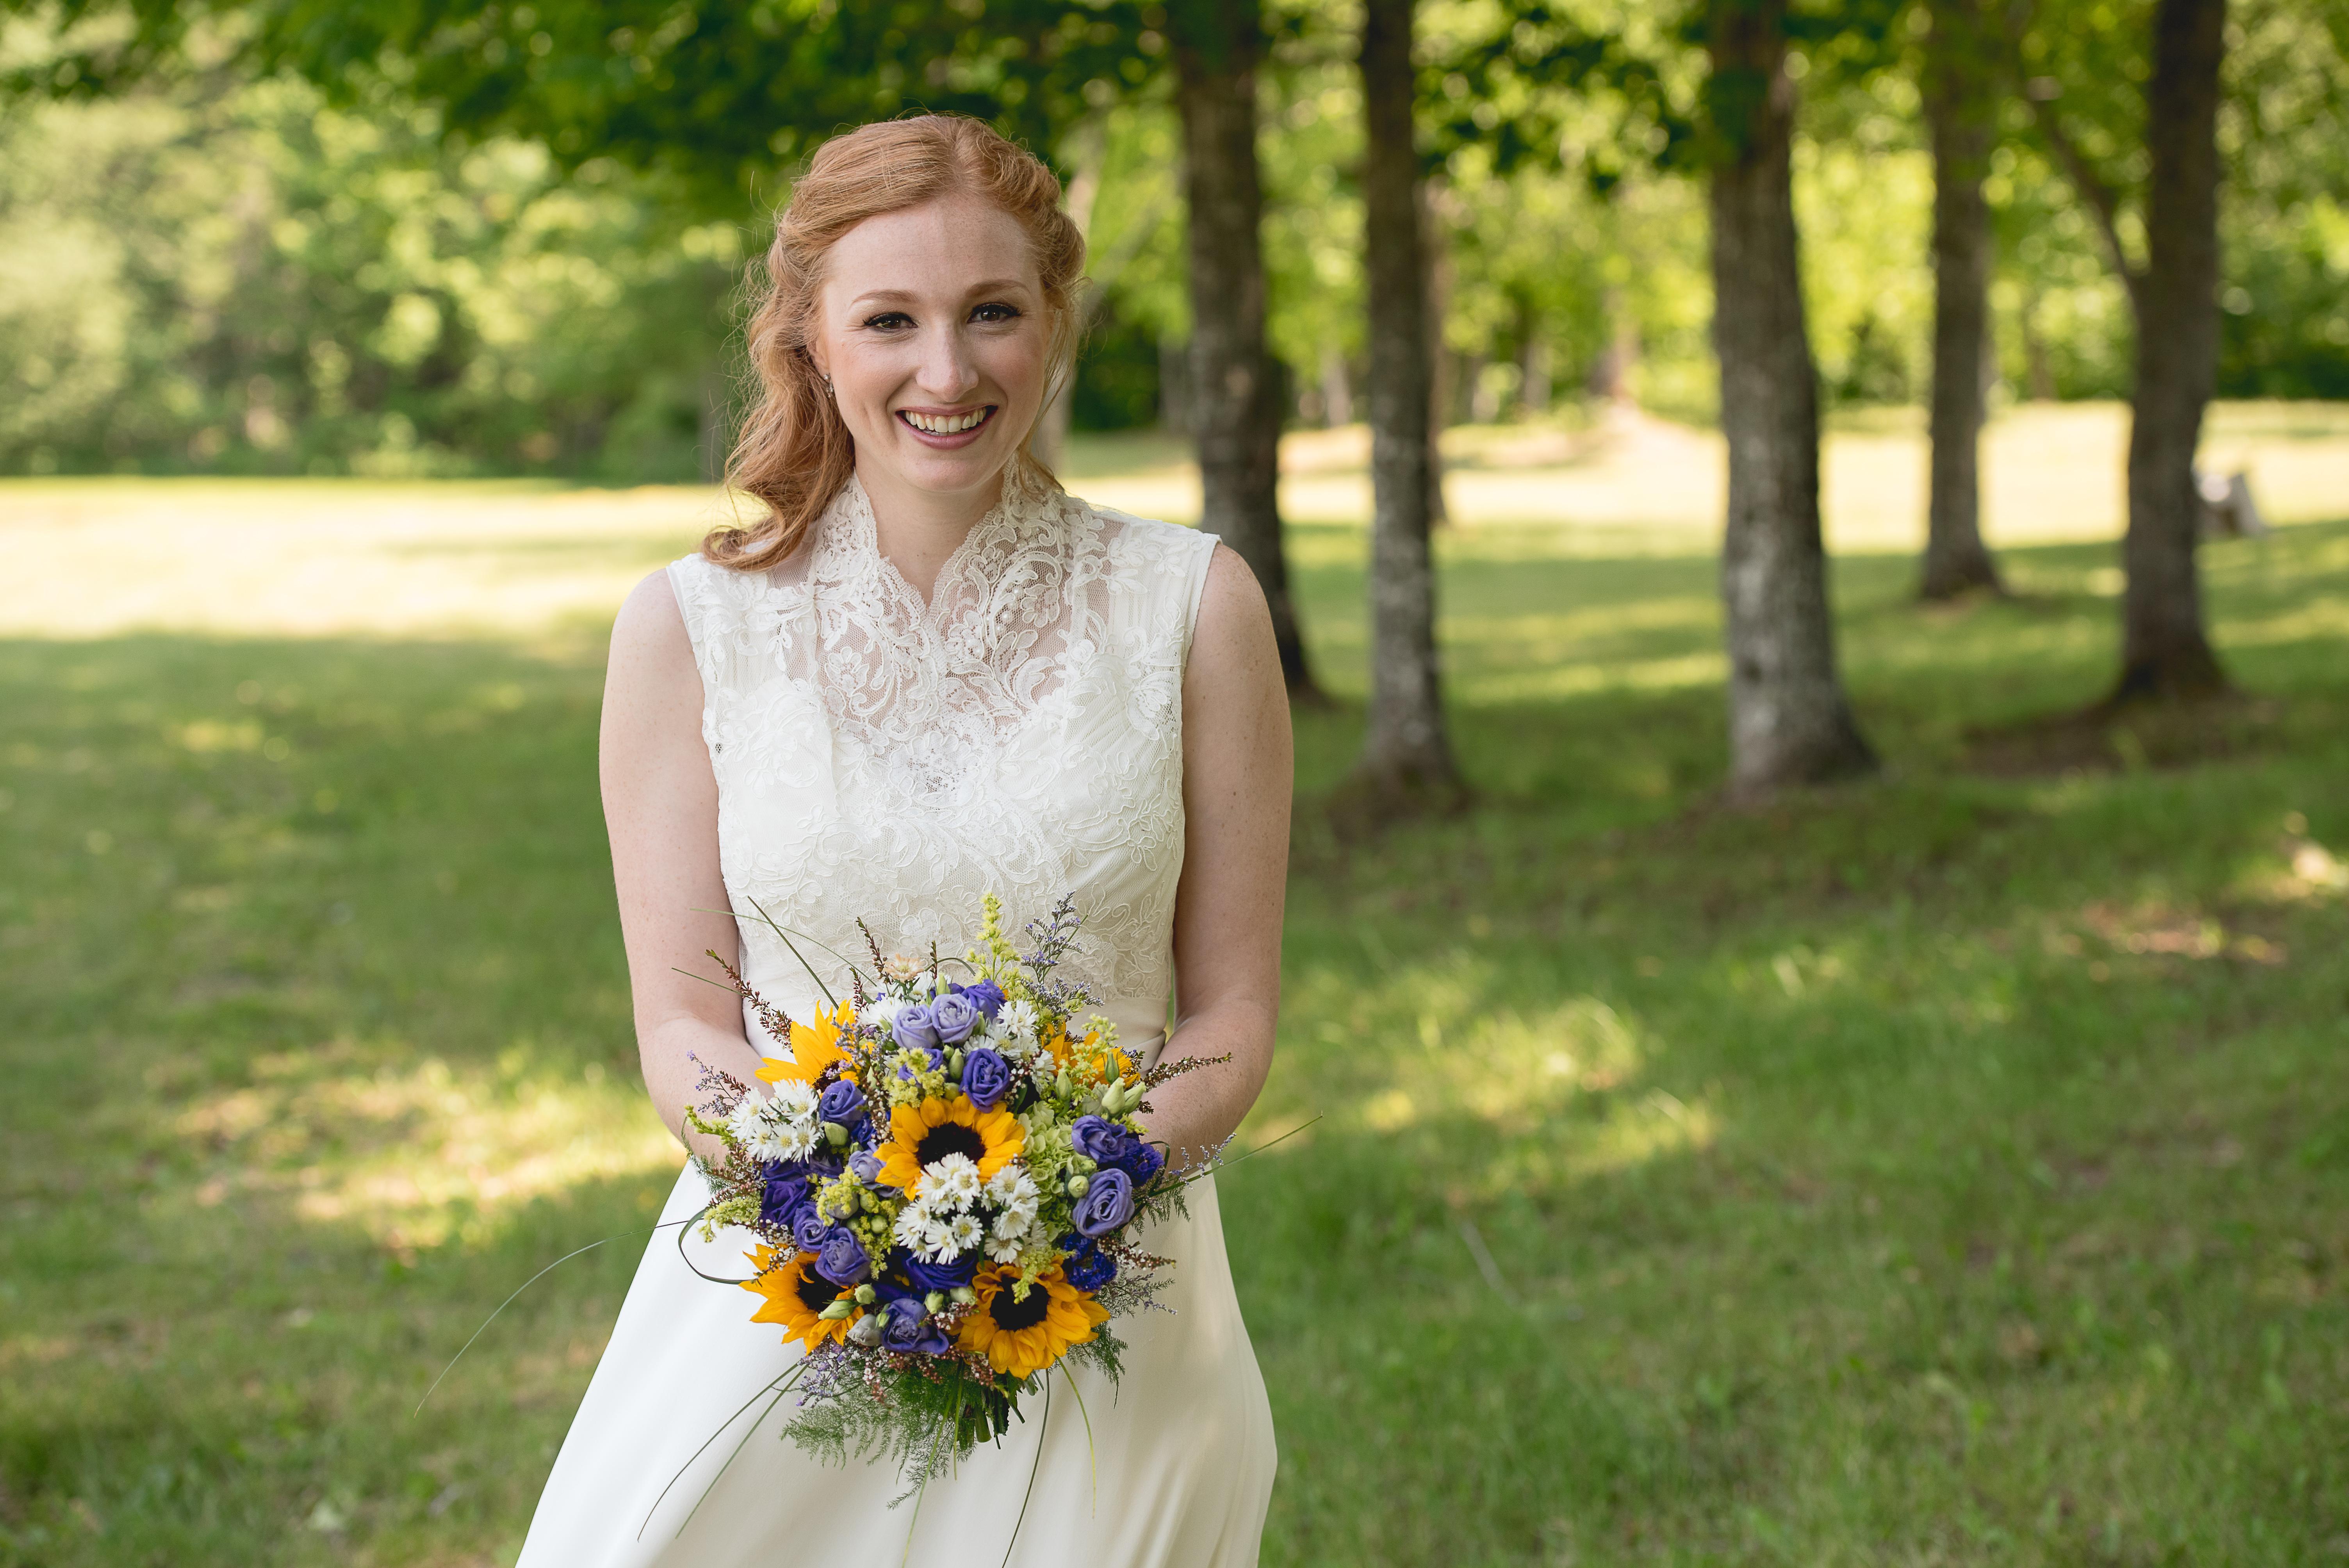 Bride Alyssa | Bridal Makeup | Beau Backstage Makeup | Fredericton New Brunswick Canada